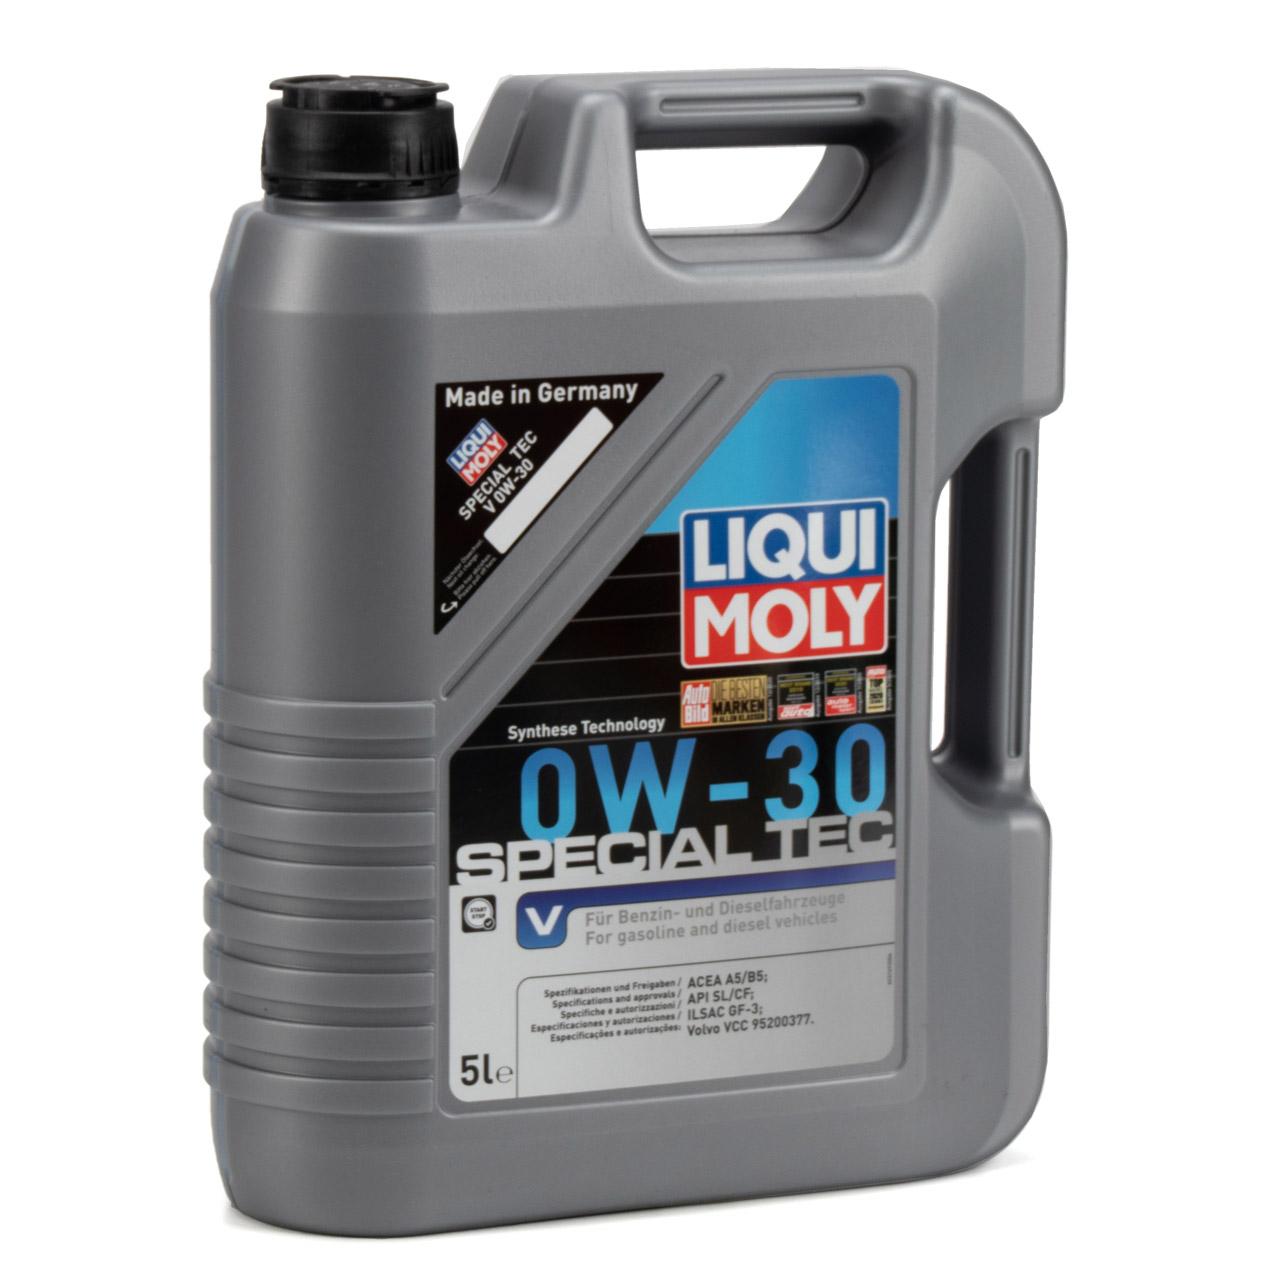 LIQUI MOLY Motoröl Öl SPECIAL TEC V 0W-30 0W30 Volvo VCC 95200377 - 10L 10 Liter